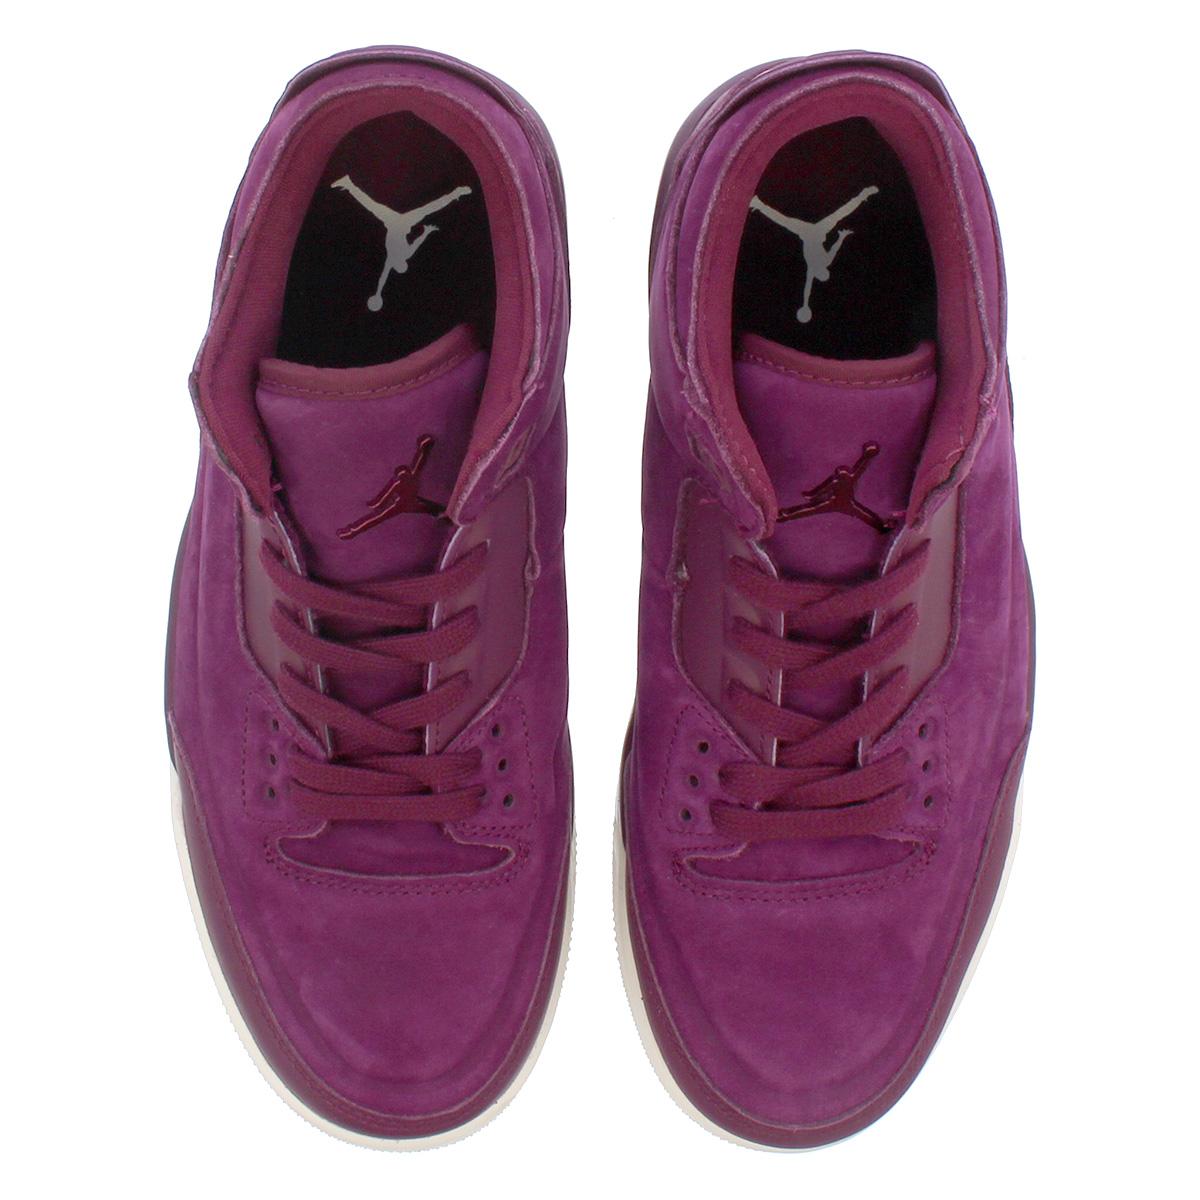 80e97b284b50ff NIKE WMNS AIR JORDAN 3 RETRO SE Nike women Air Jordan 3 nostalgic SE  BORDEAUX PHANTOM ah7859-600